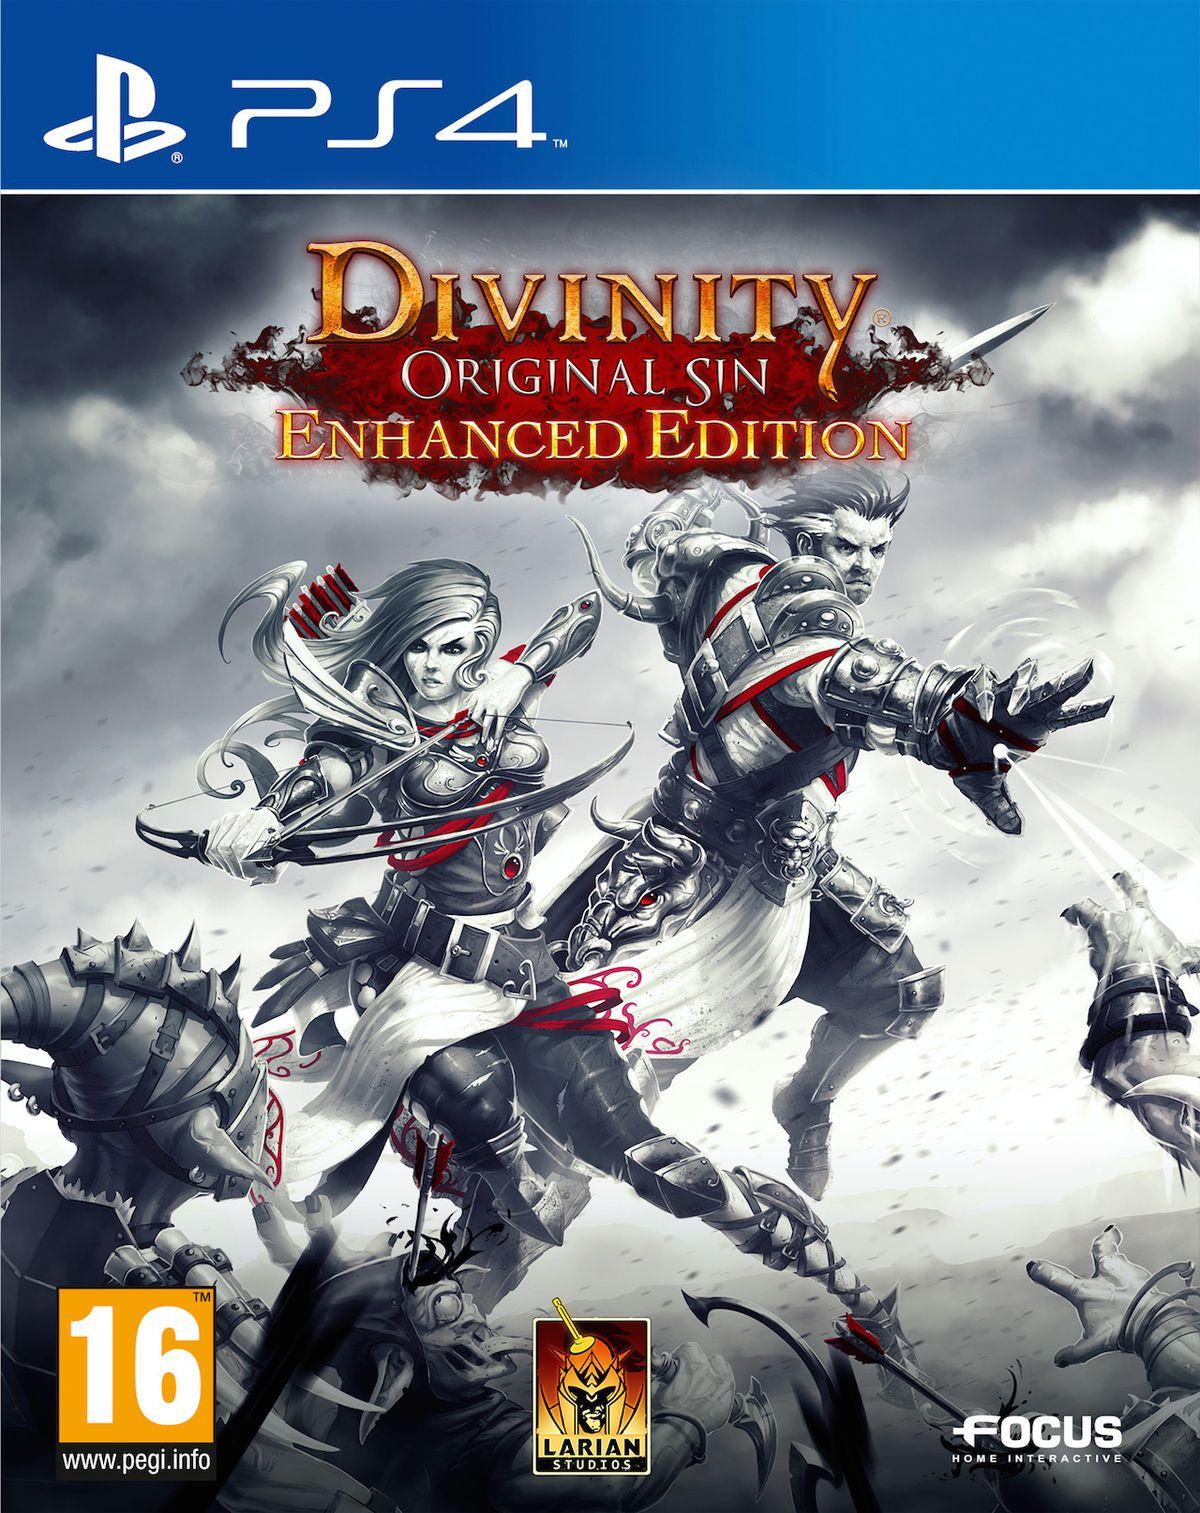 Divinity: Original Sin console boxes